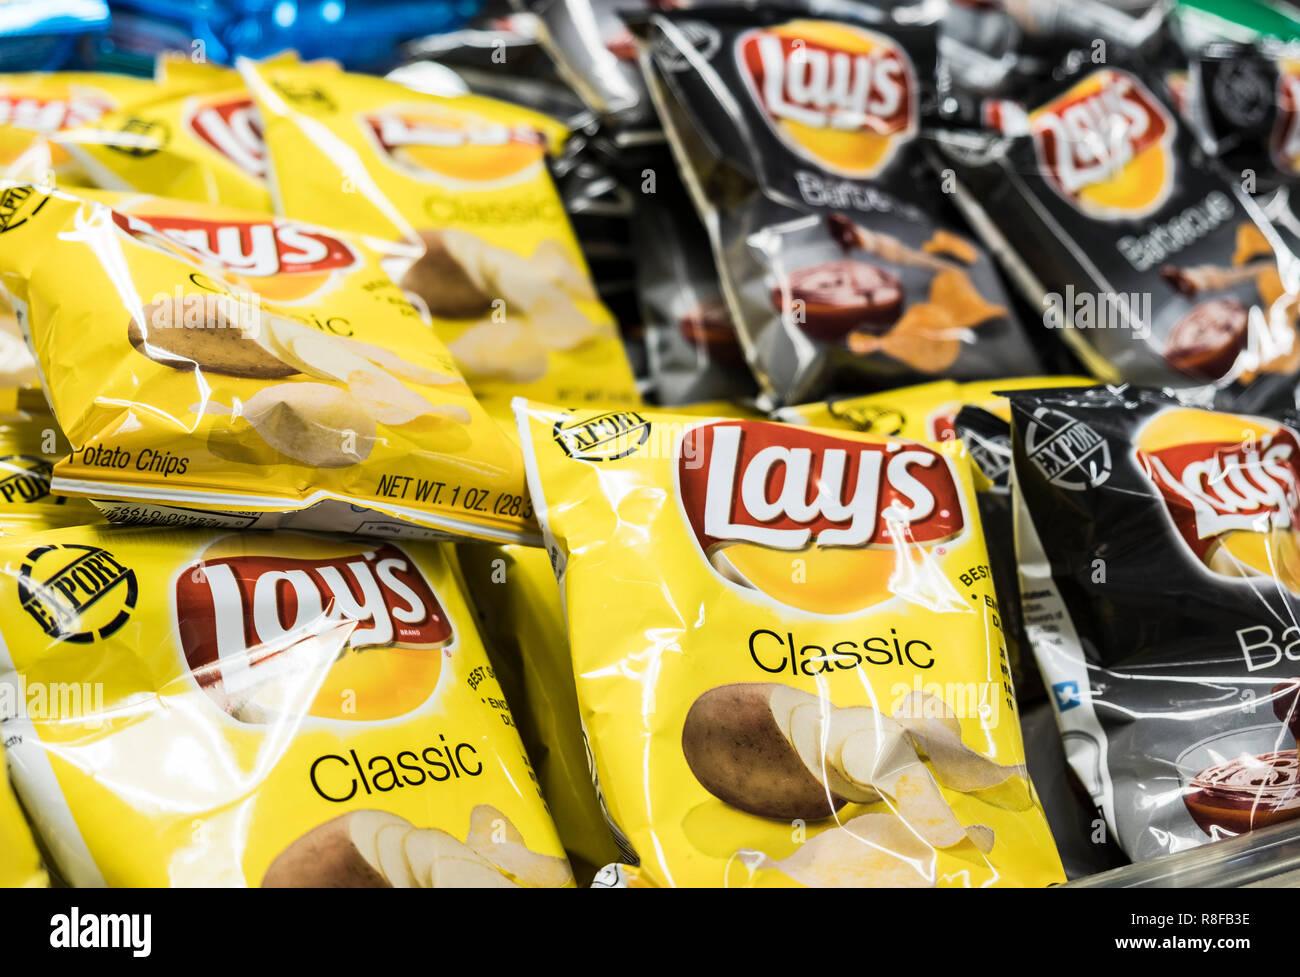 Lays Potato Chips Stock Photos & Lays Potato Chips Stock Images - Alamy